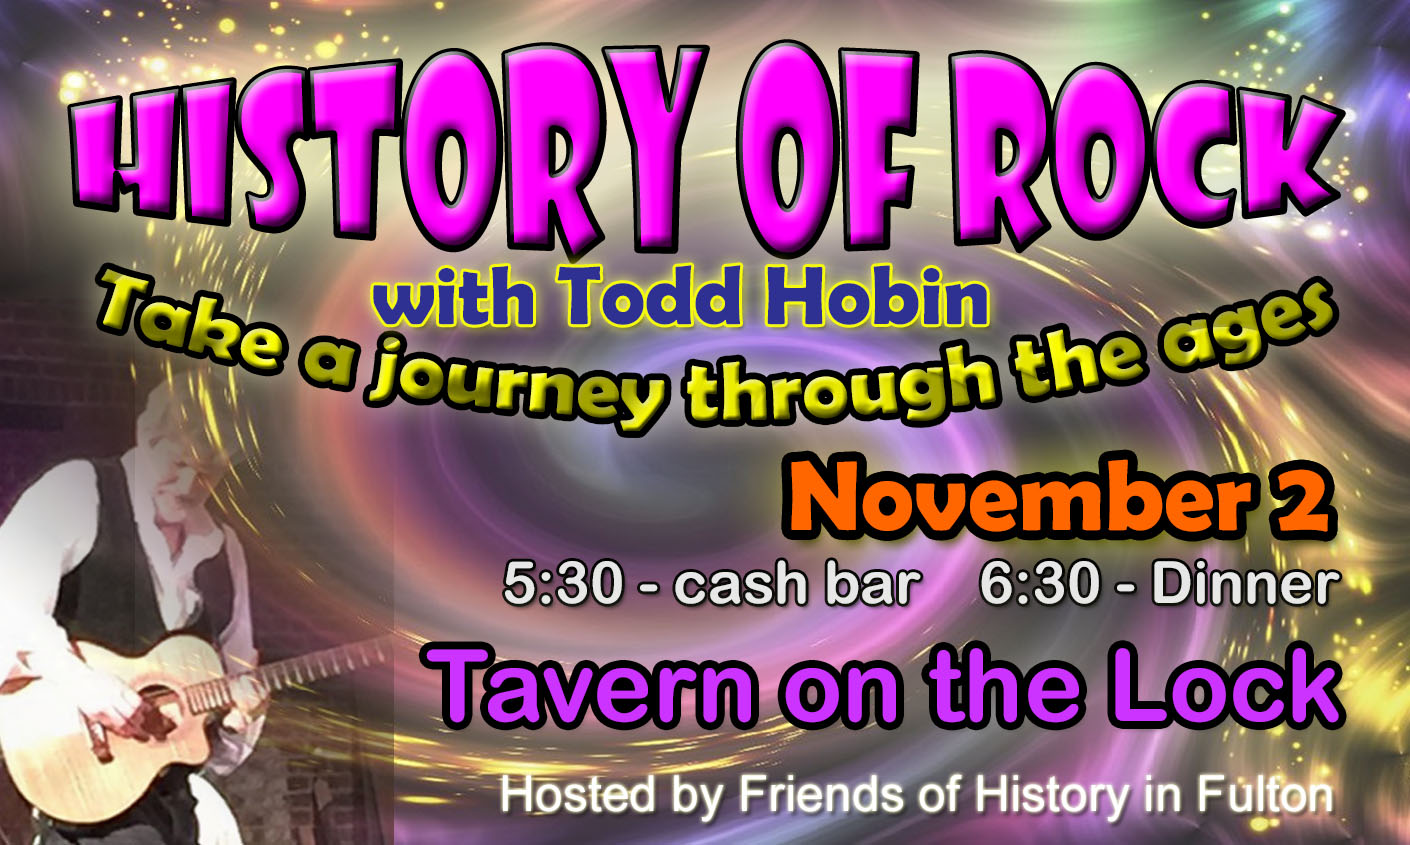 HistoryofRock-postcard-for-newsletter.jpg